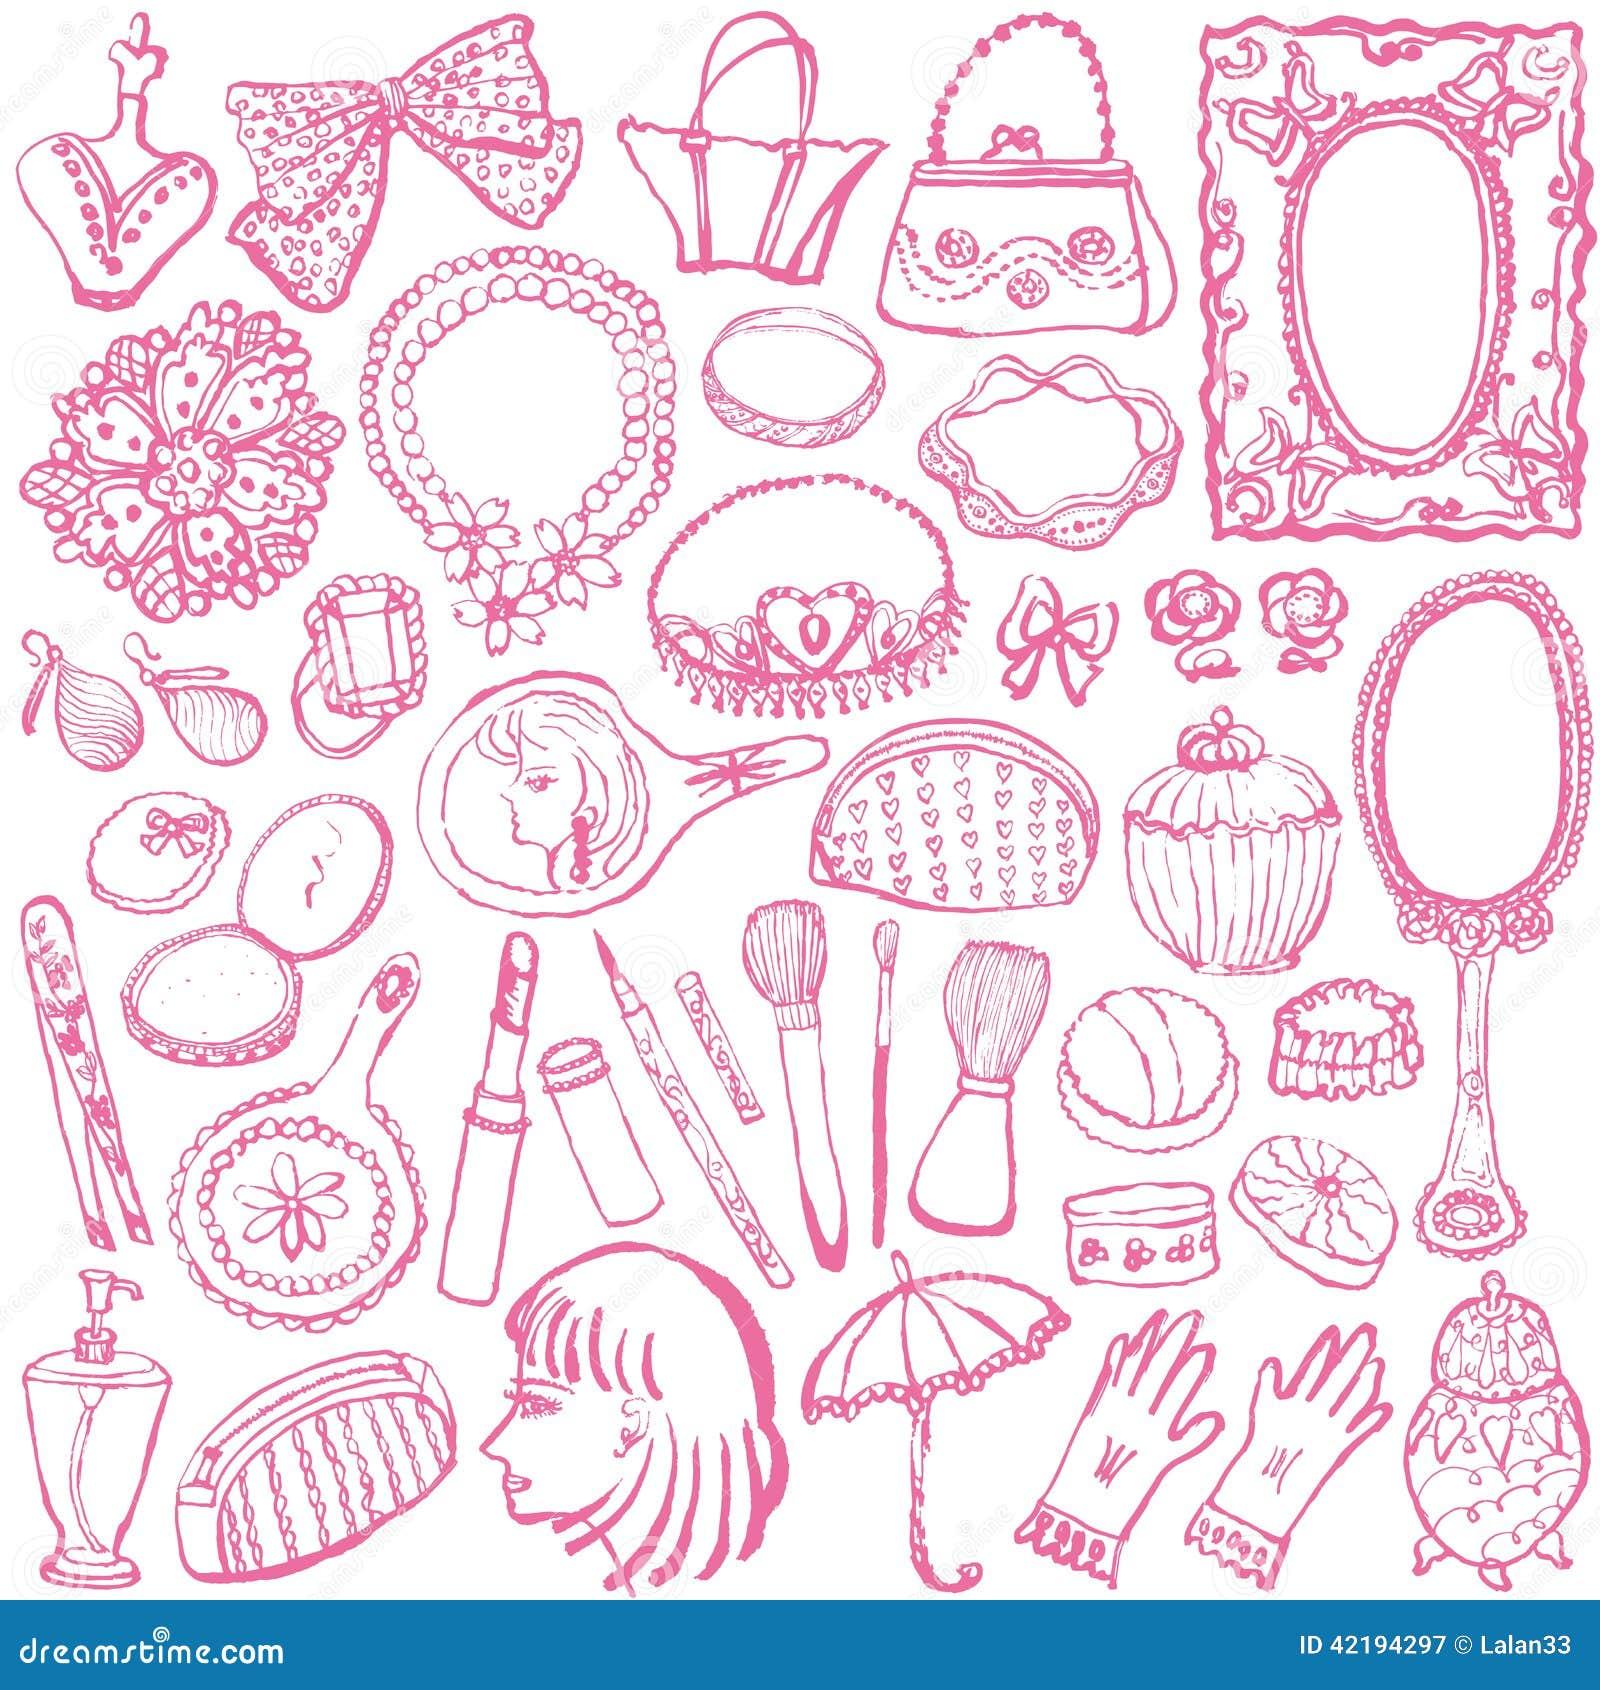 Girly Illustrations. Stock Vector